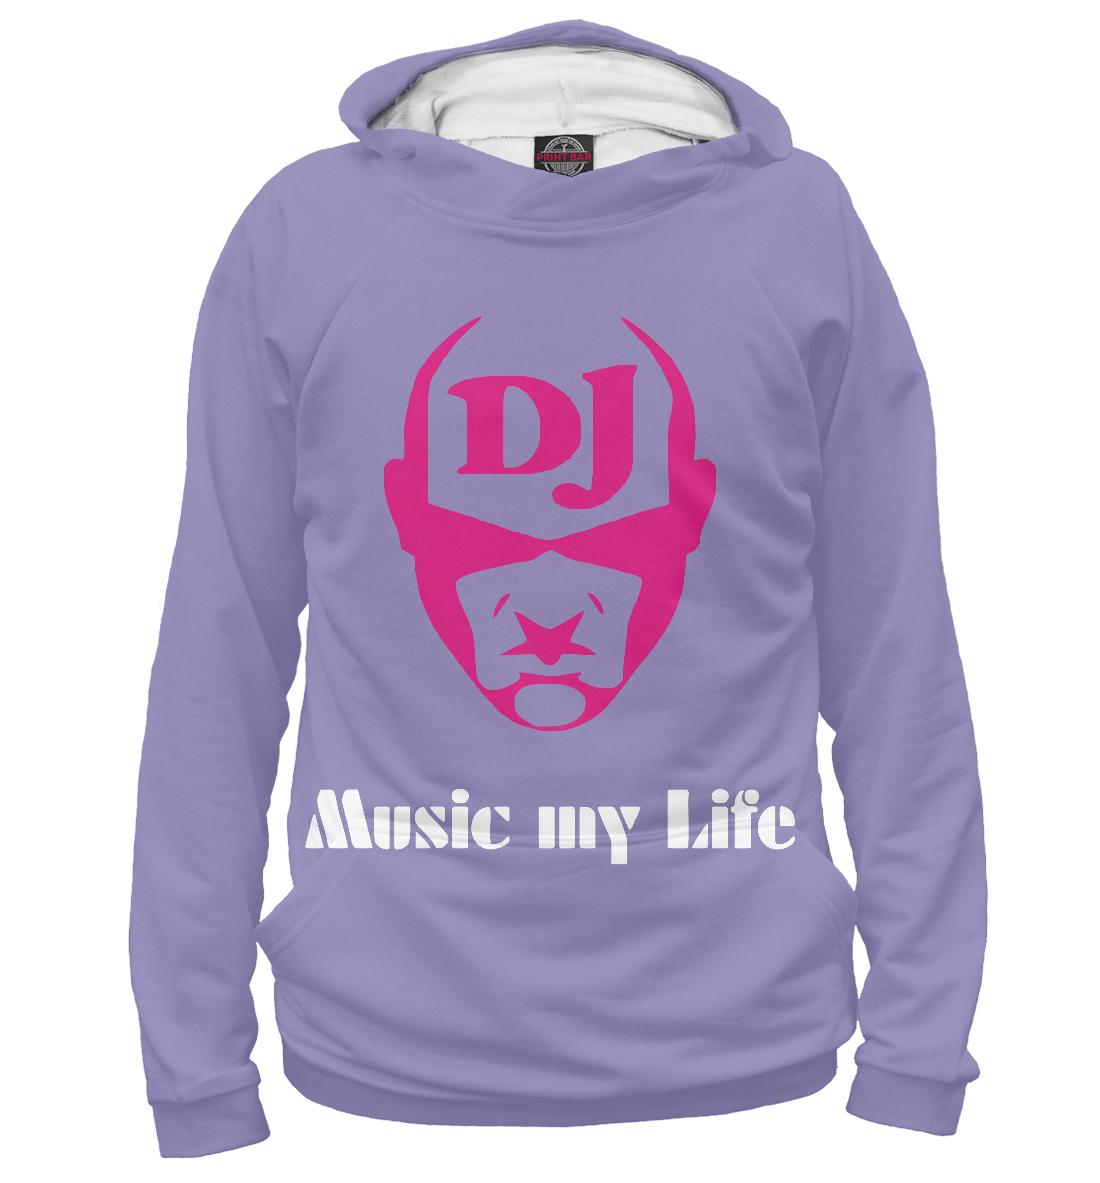 Music my life music saved my life